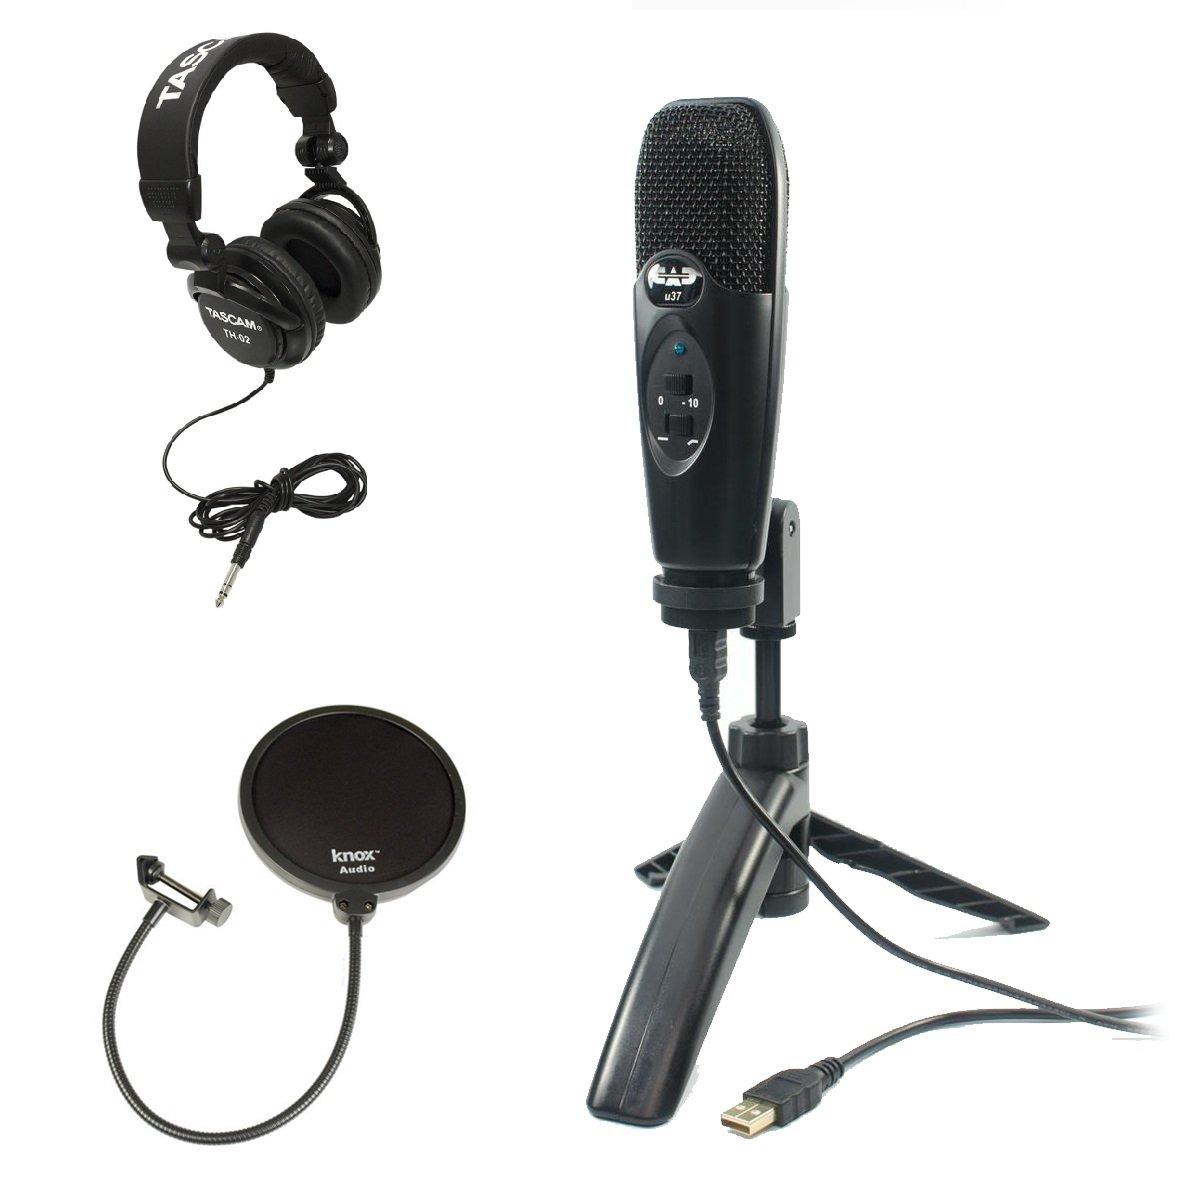 Cad U37 USB Condenser Microphone (Black) with Headphones and Pop Filter